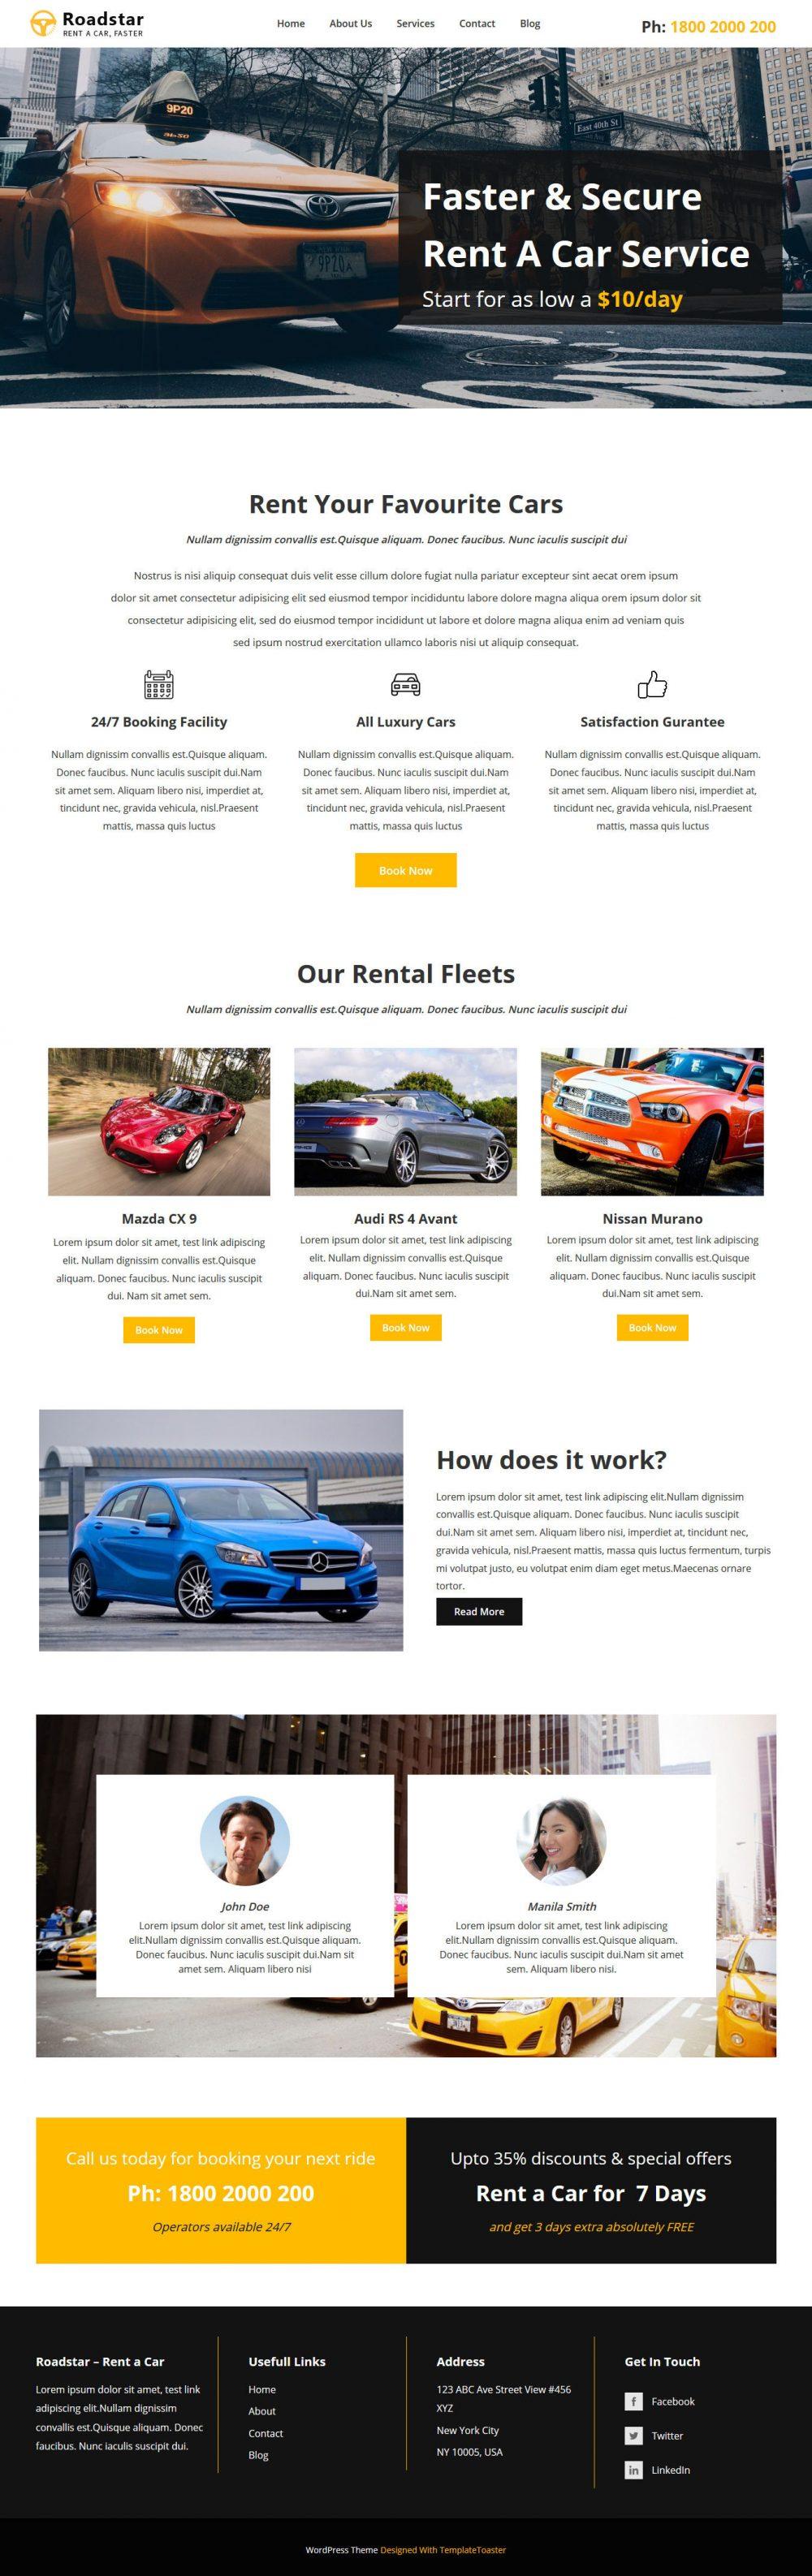 roadstar car rental services joomla template